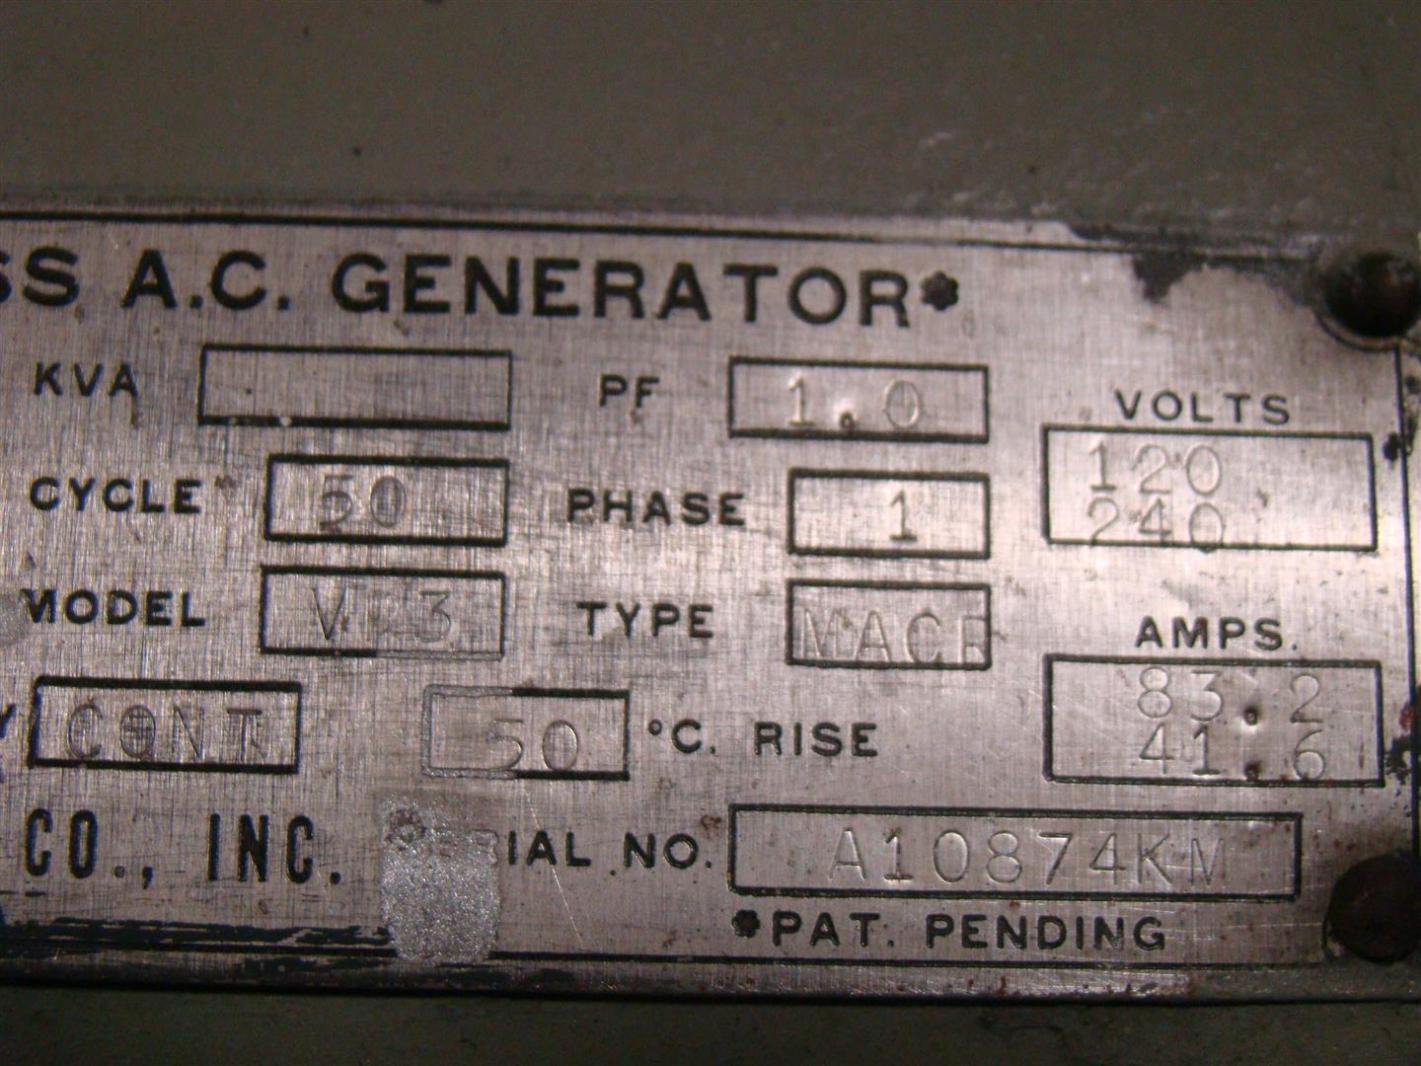 hight resolution of lima generator wiring diagram lima image wiring condec lima brushless ac generator 10kw 1500rpm ph1 120